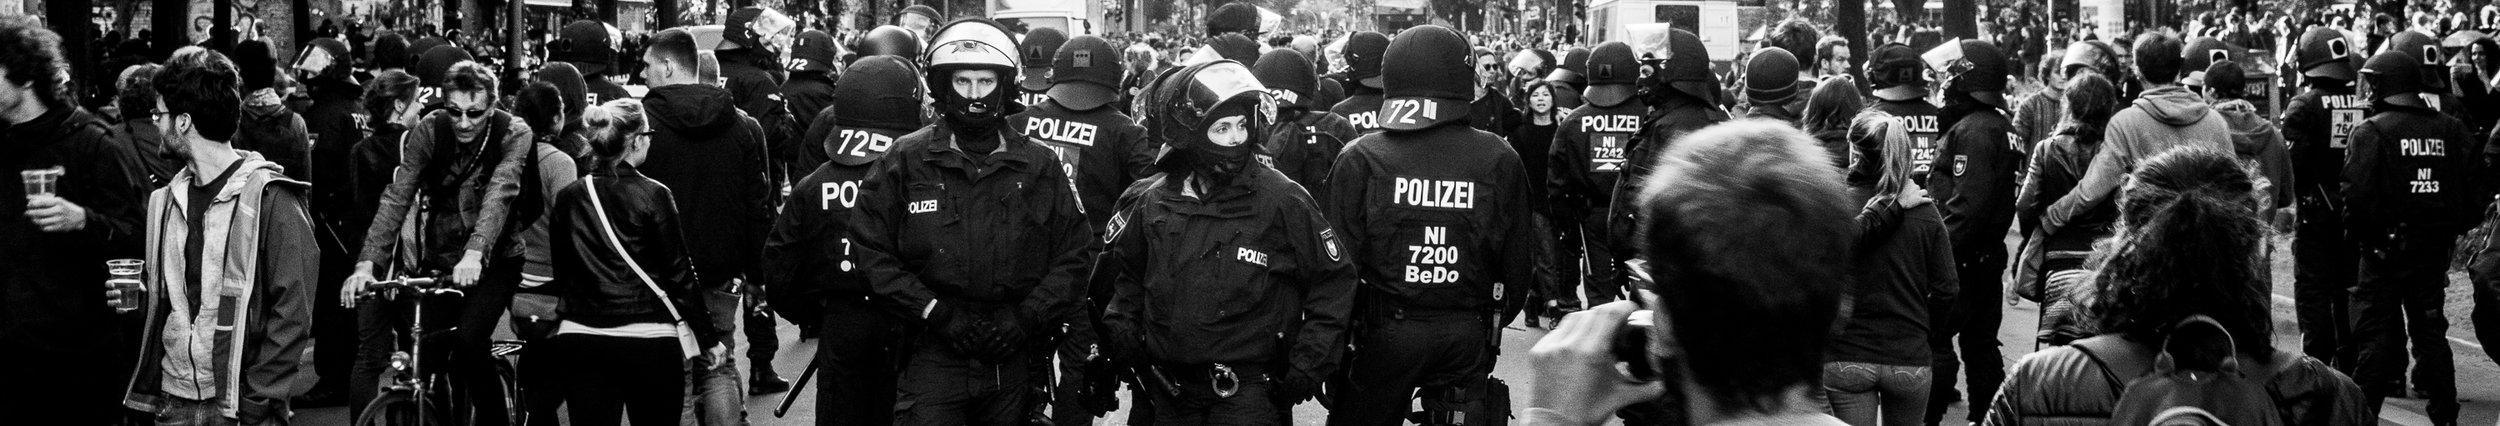 May Day, Kreuzberg, Berlin, 2018